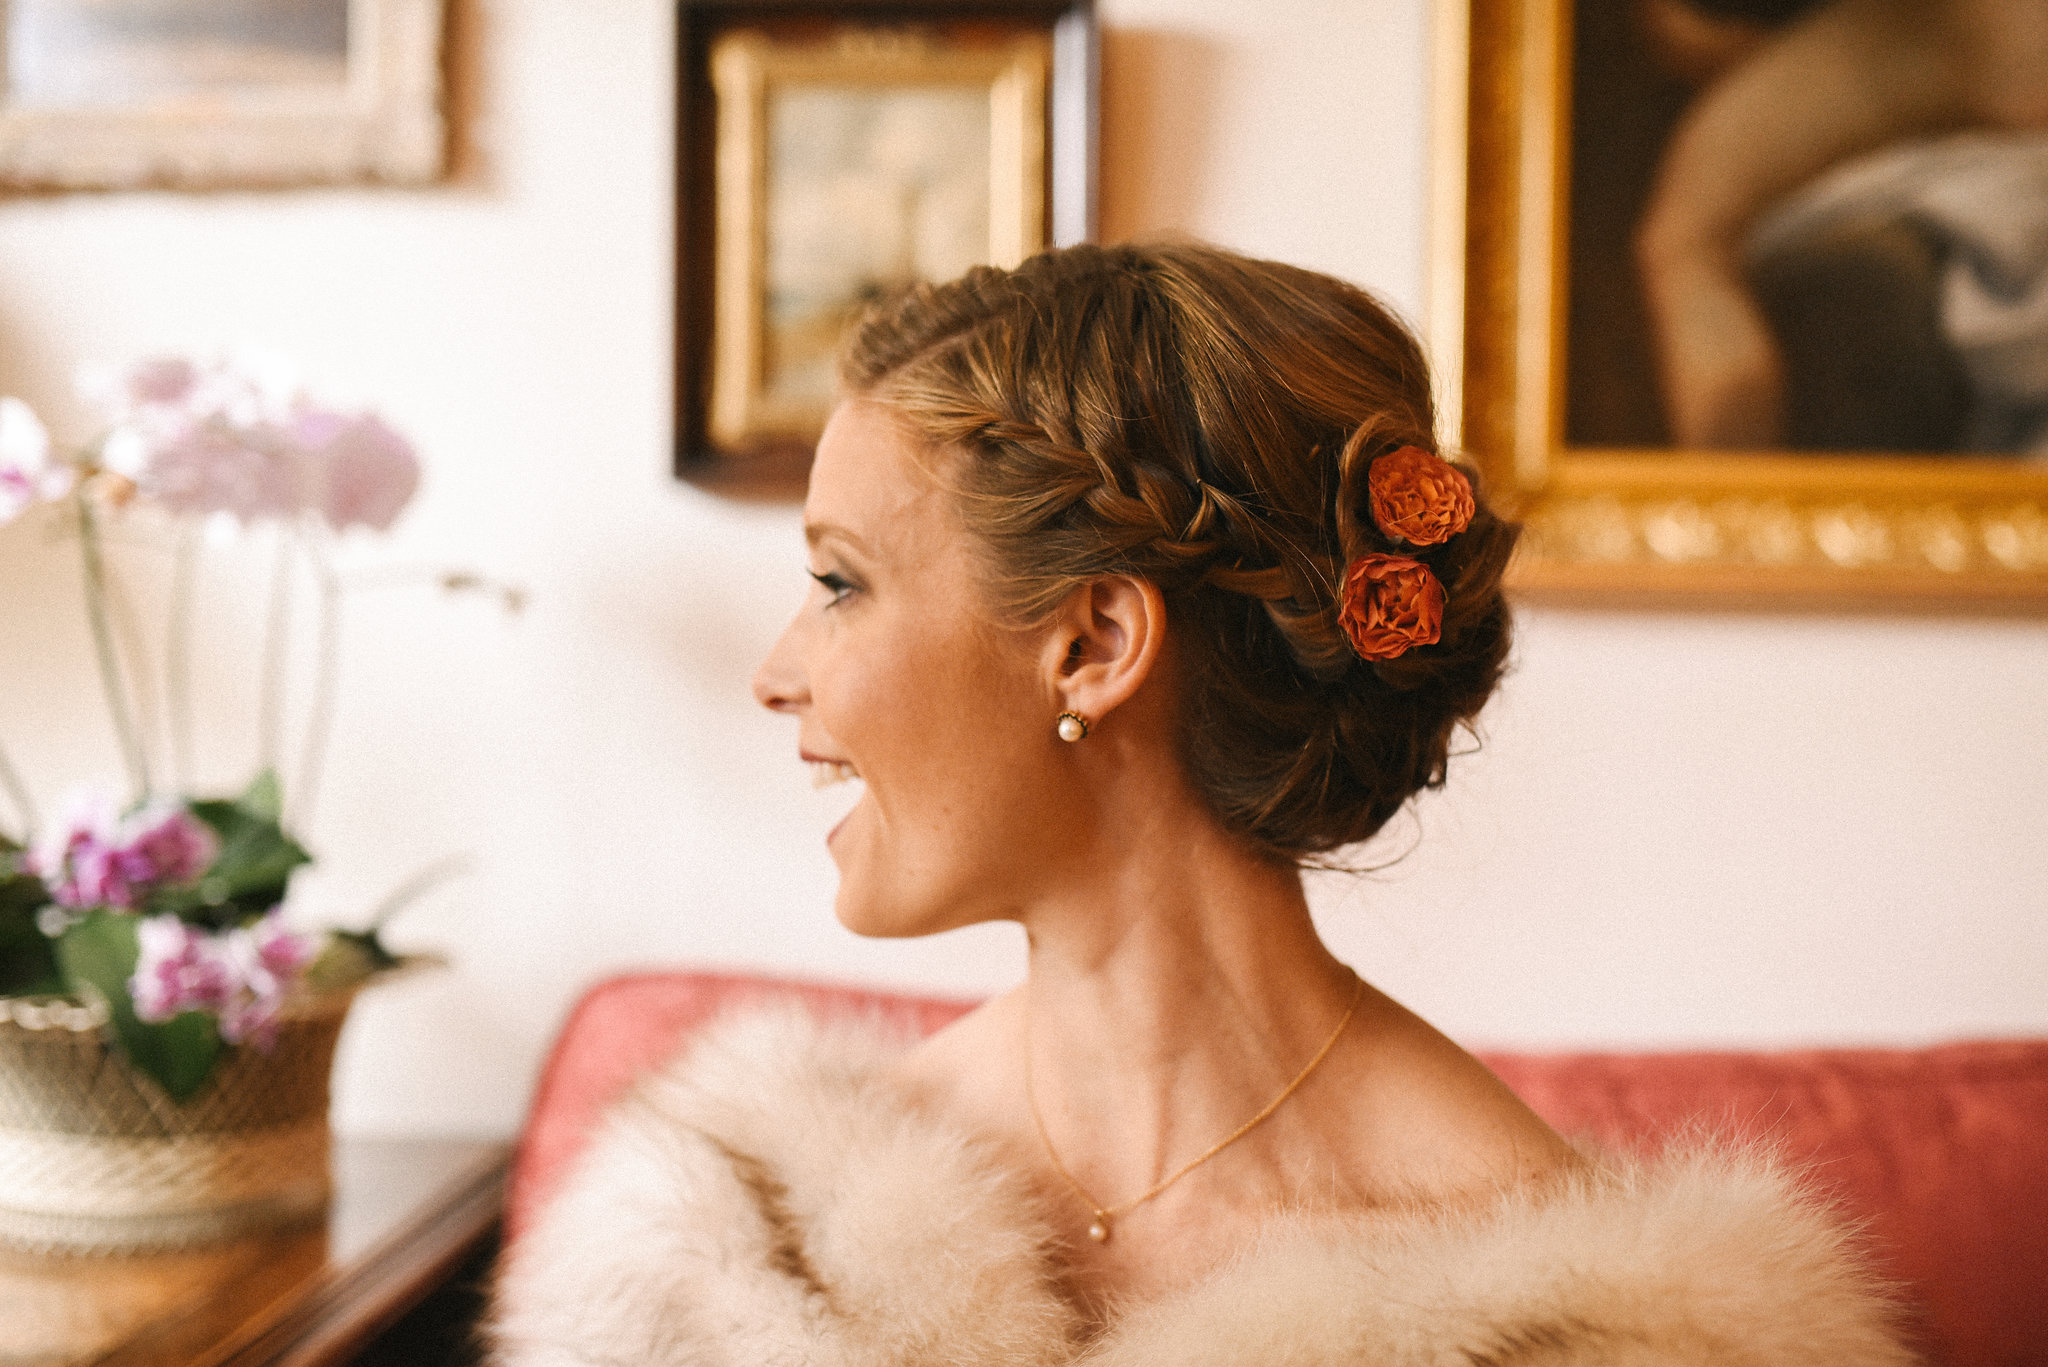 Alexandria, Fall Wedding, Historic Wedding, Old Town, DC, Fur Wrap, Rustic, Glam, Vintage, Wedding Jewelry, The London Bob Hair Design, Bride Photo, Romantic